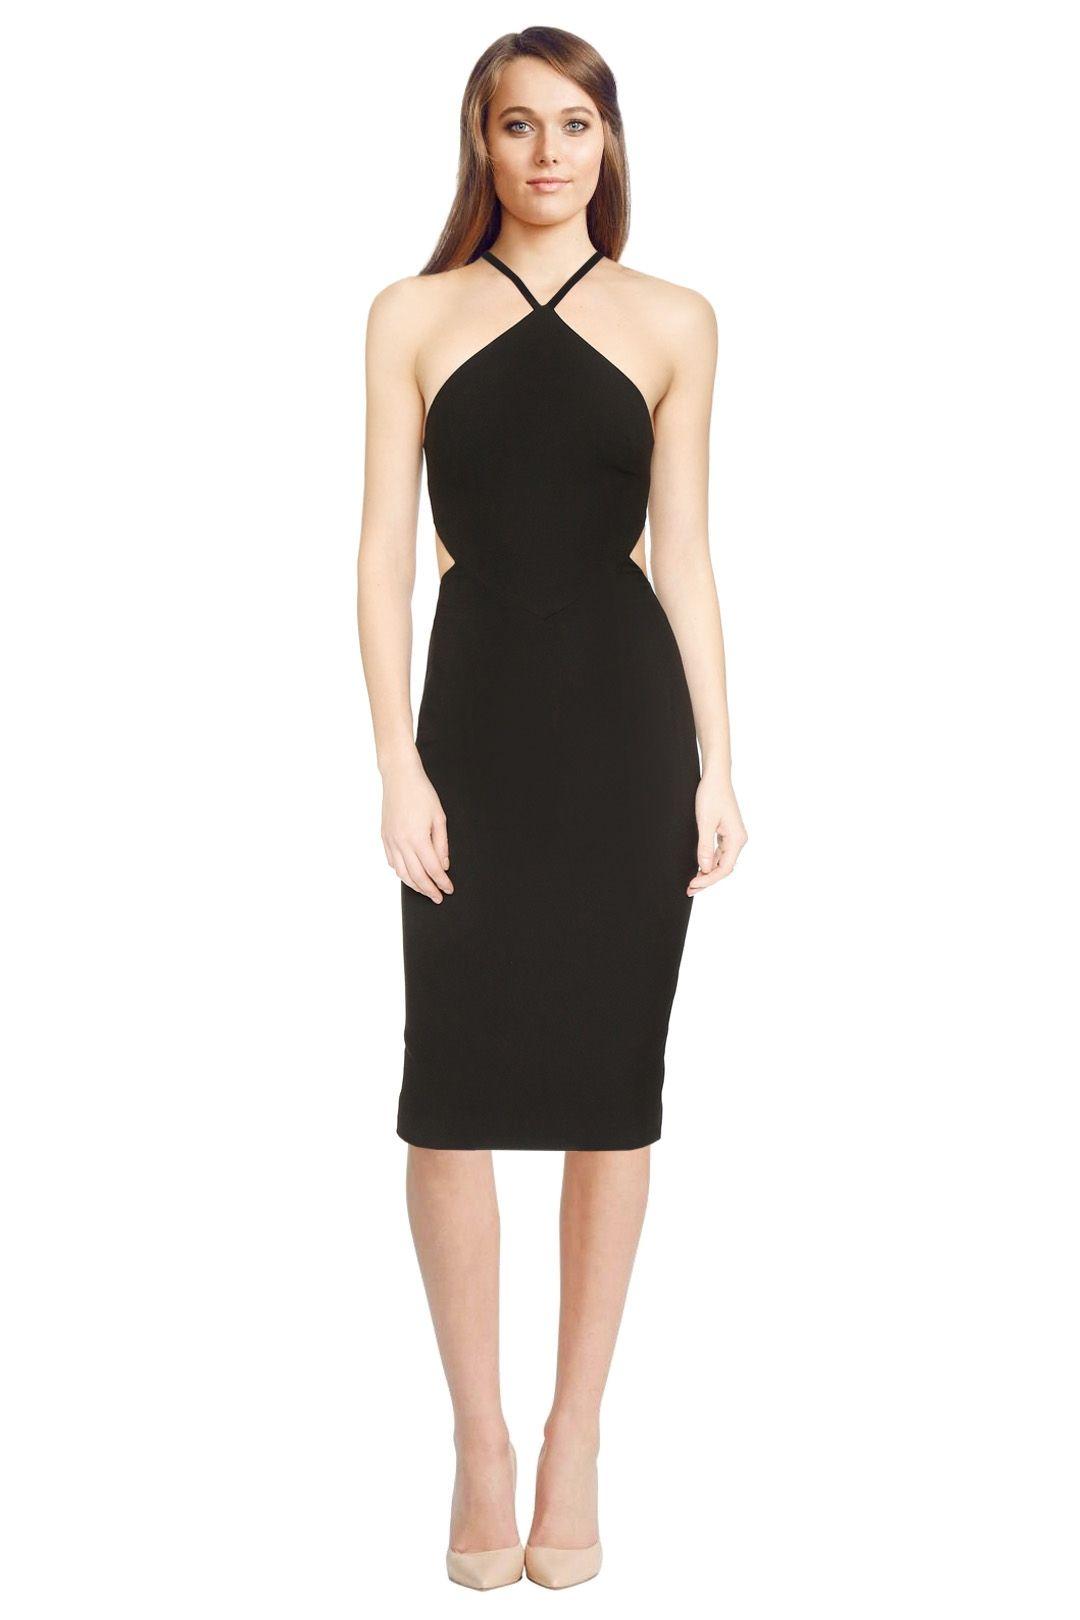 Elizabeth And James - Riza Dress - Black - Front